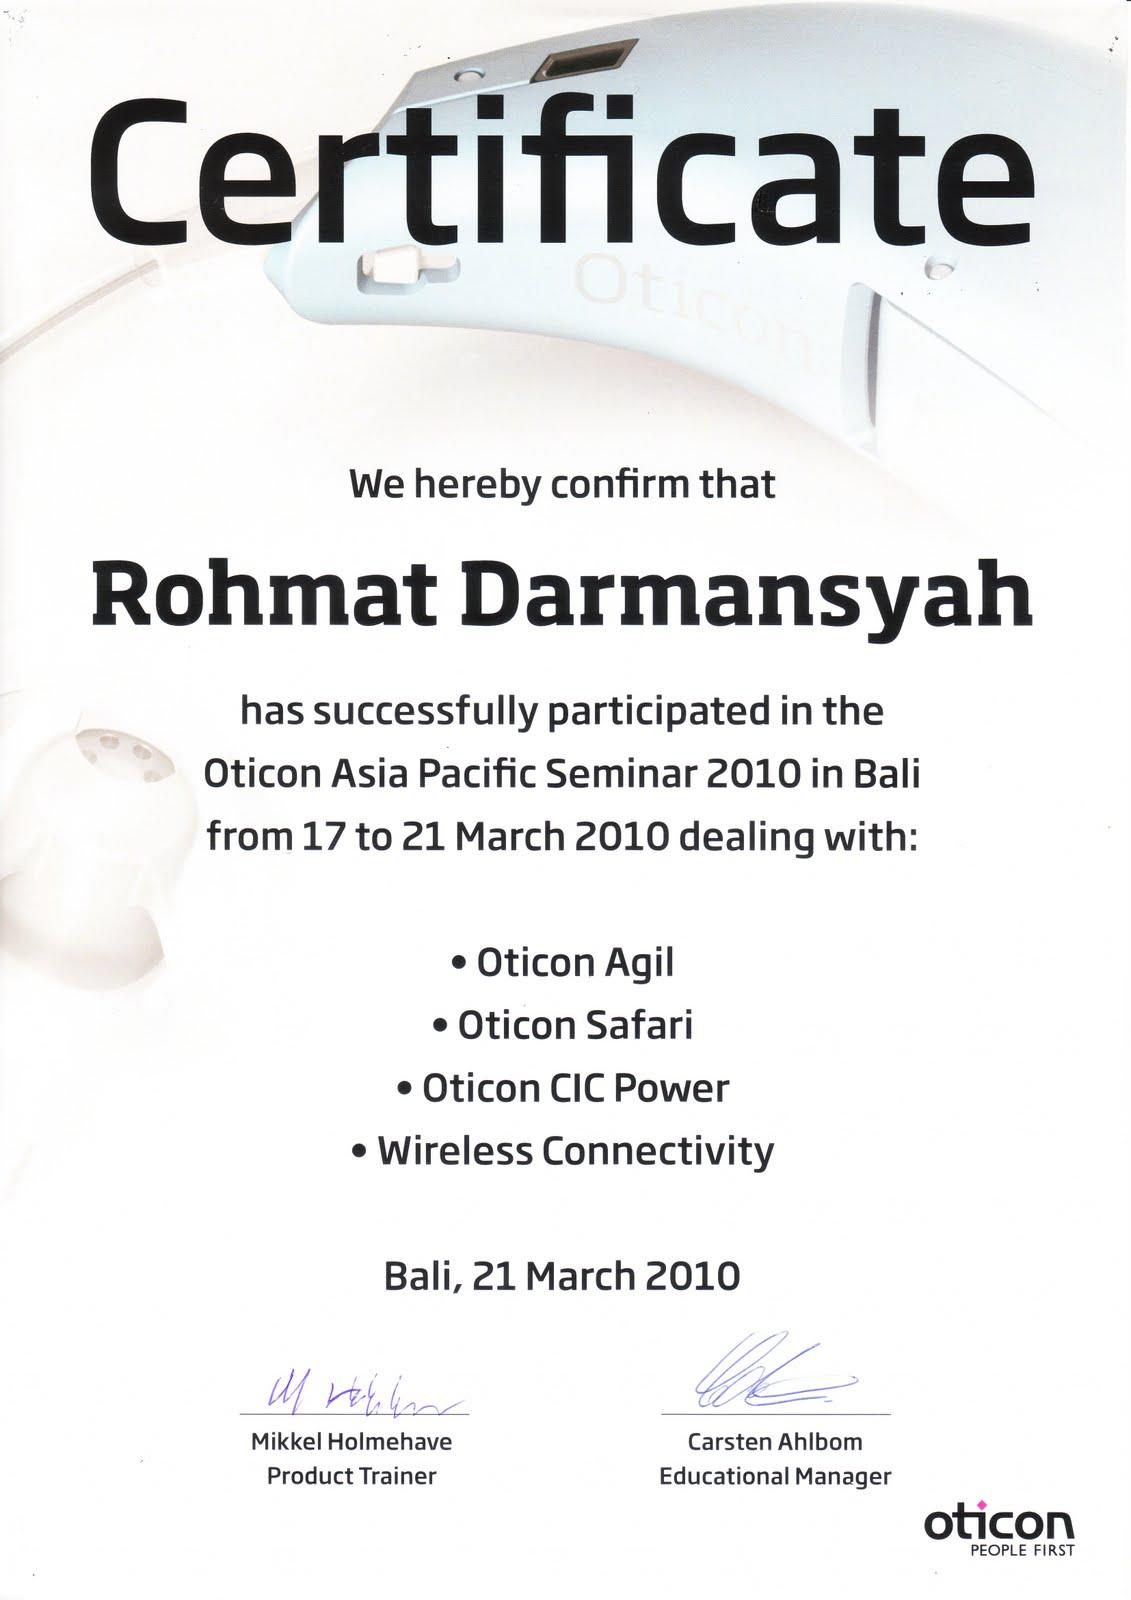 oticon indonesia sertificate of oticon export seminar. Black Bedroom Furniture Sets. Home Design Ideas